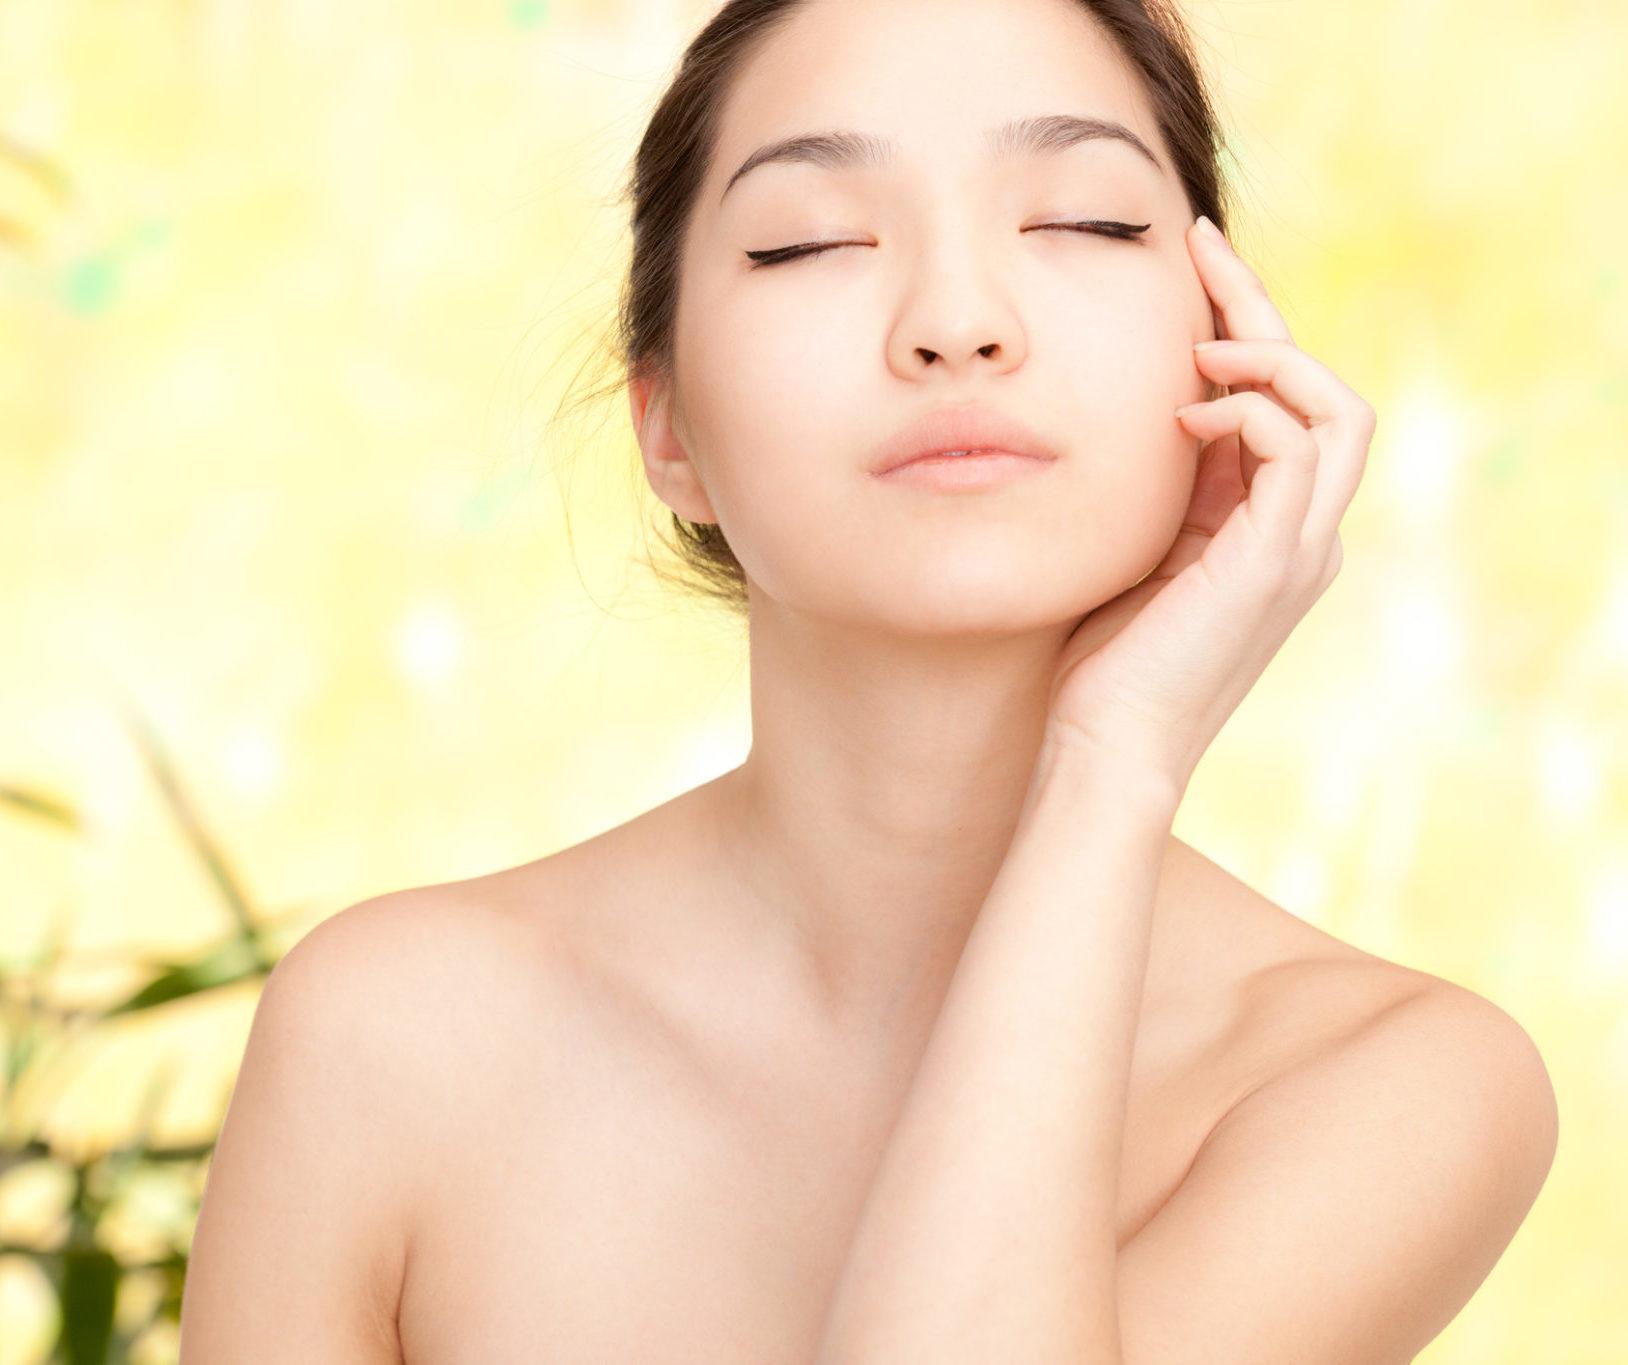 Glass Skin: 8 αποτελεσματικά προϊόντα για να κάνεις το Κορεάτικο skincare trend τρόπο ζωής Η καλοκαιρινή πρόταση της Avon ακούει στο όνομα Κ-Beauty και έρχεται να σε μυήσει σε ένα απολαυστικό τελετουργικό περιποίησης, με αύρα Ανατολής.